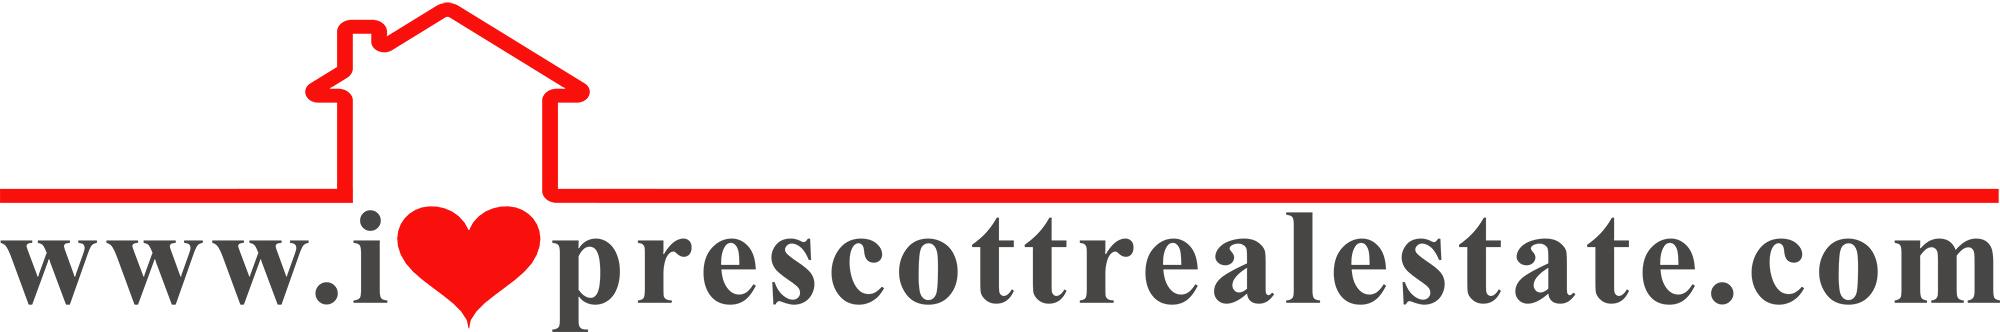 Custom Logo Design for ILovePrescottRealEstate